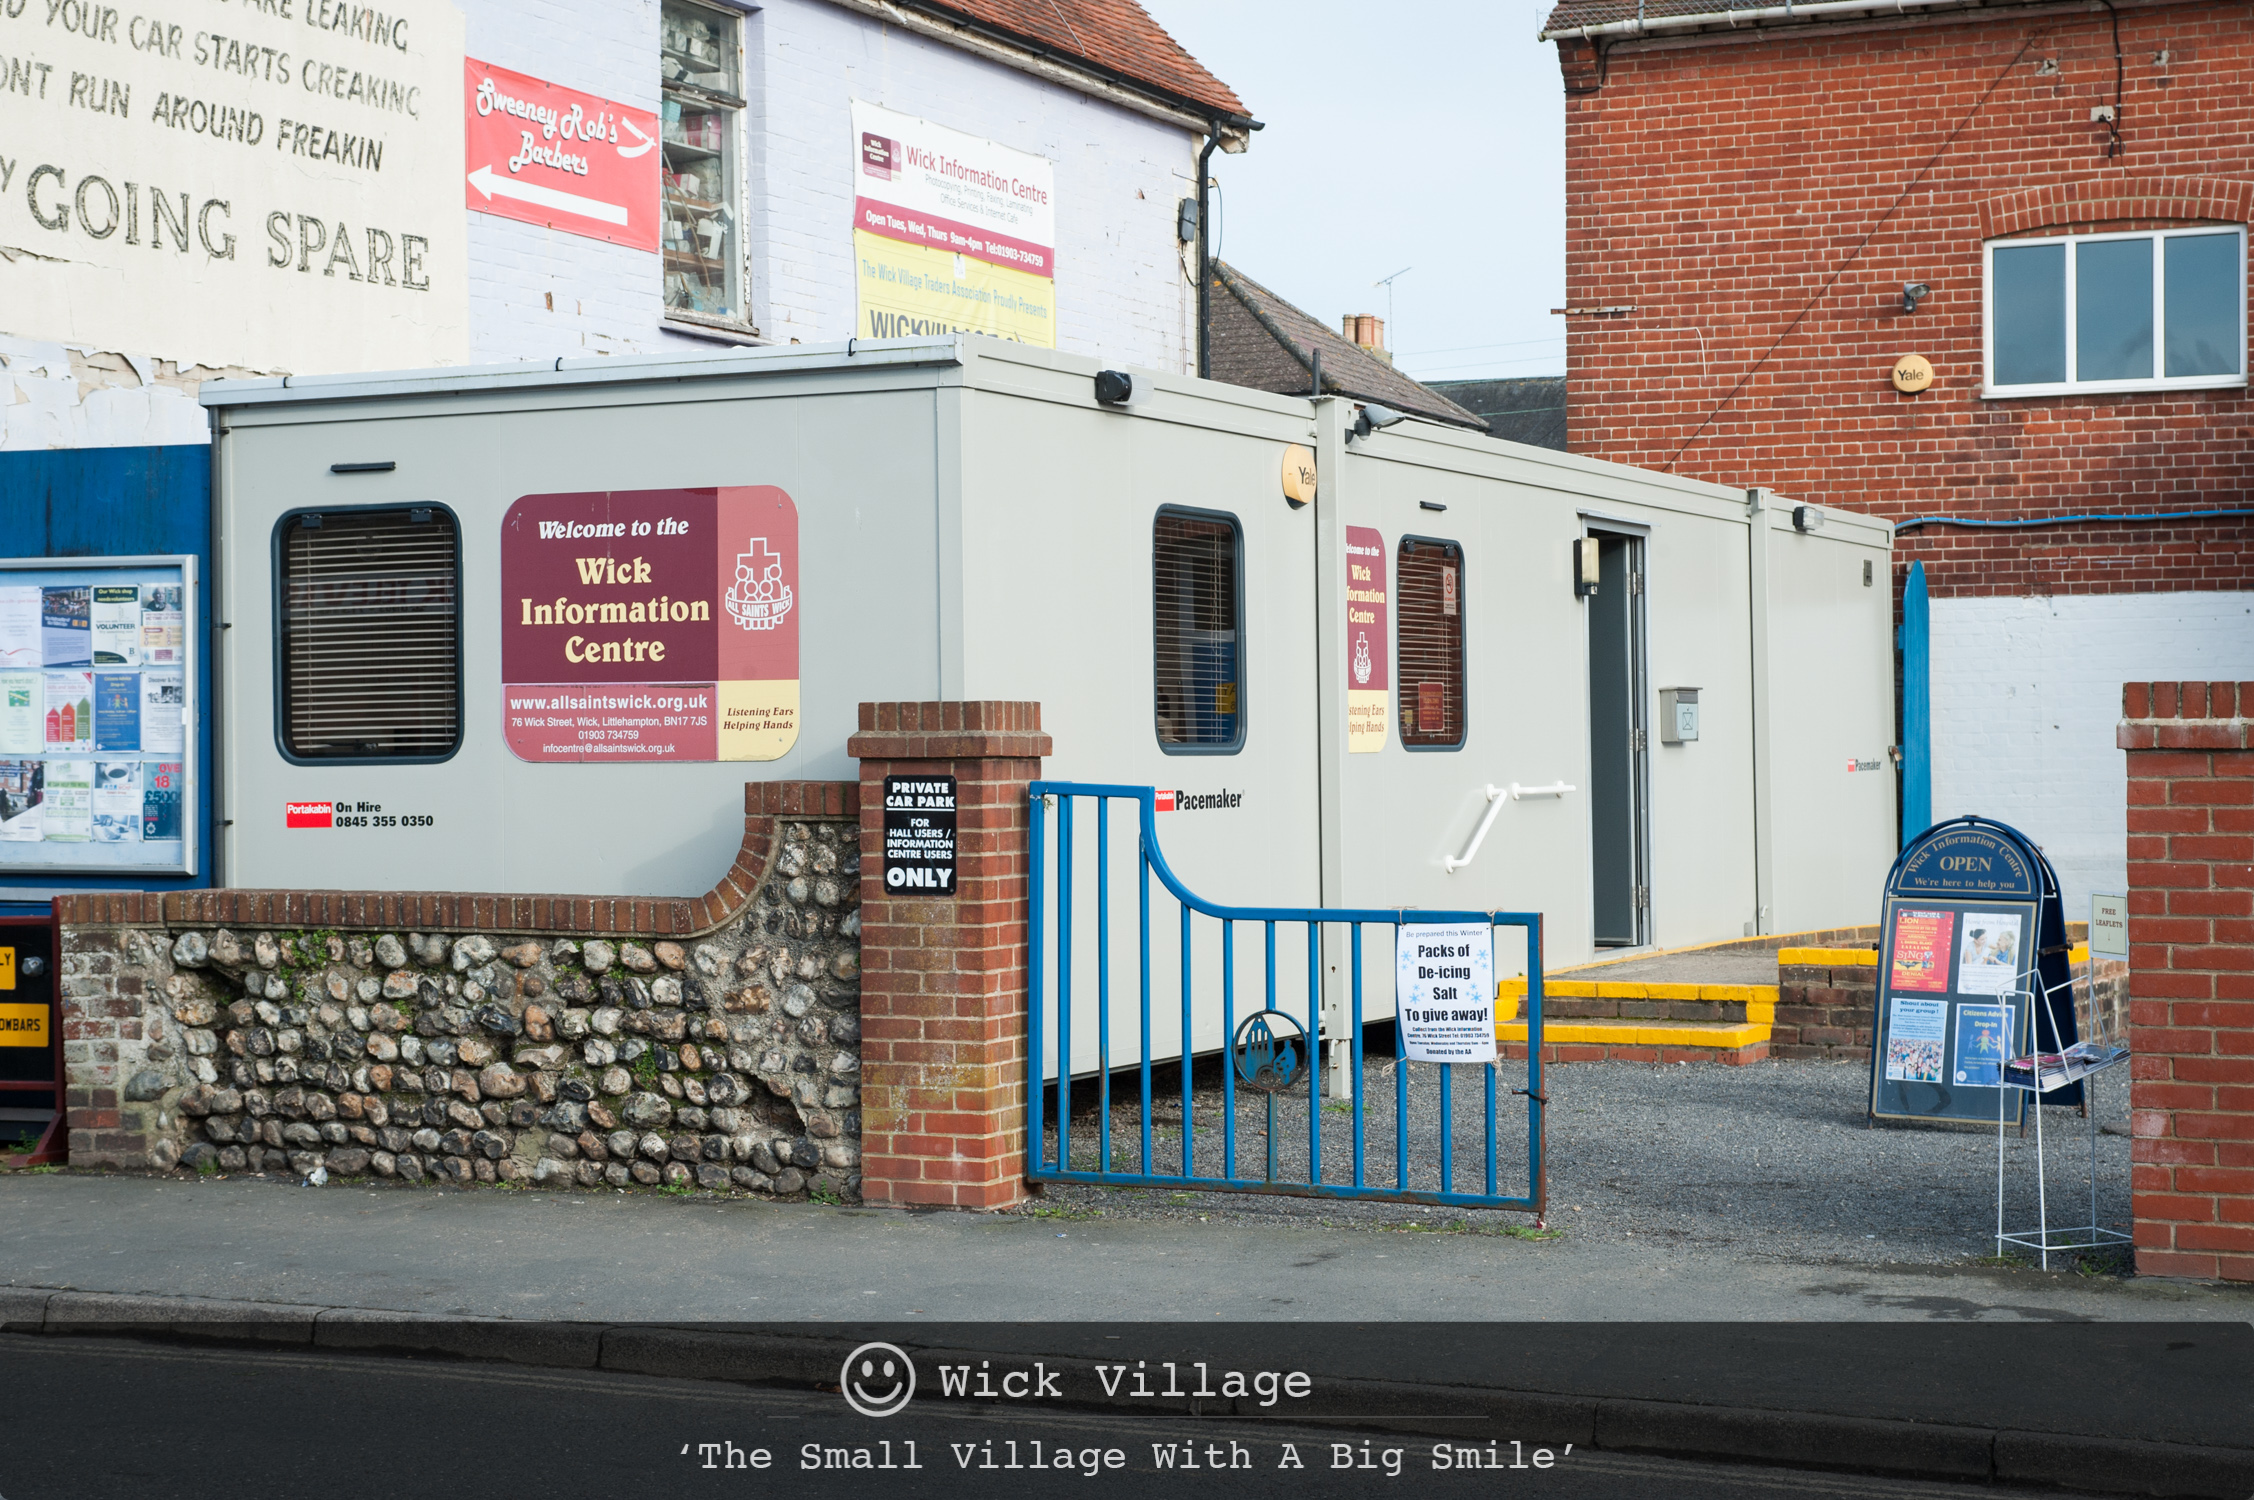 Wick Information Centre, Wick Village, Littlehampton.